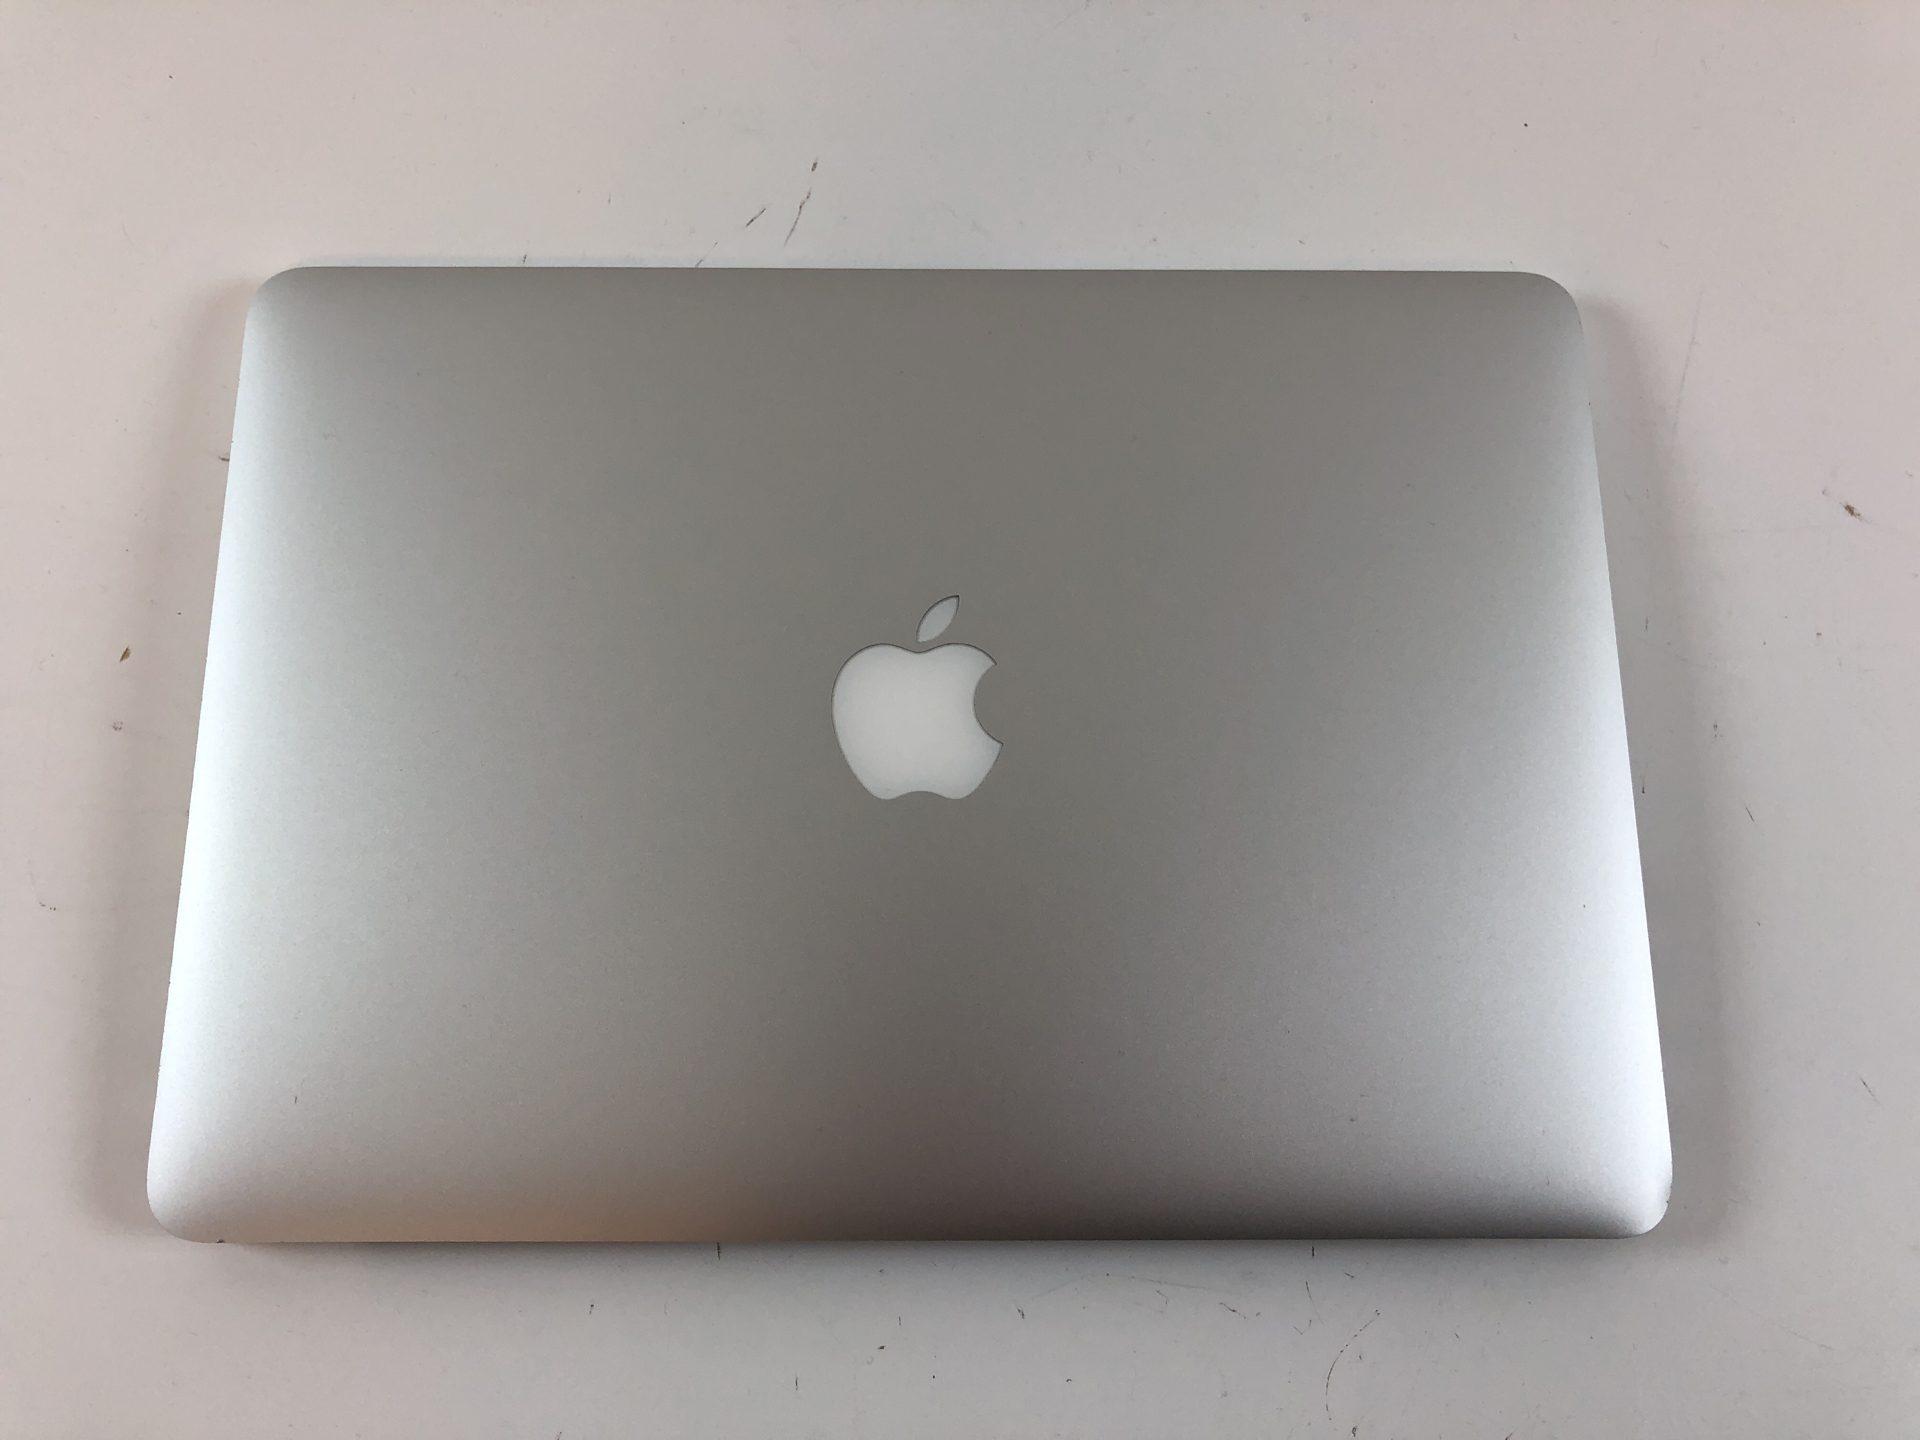 "MacBook Pro Retina 13"" Late 2013 (Intel Core i5 2.6 GHz 16 GB RAM 512 GB SSD), Intel Core i5 2.6 GHz, 16 GB RAM, 512 GB SSD, Kuva 2"